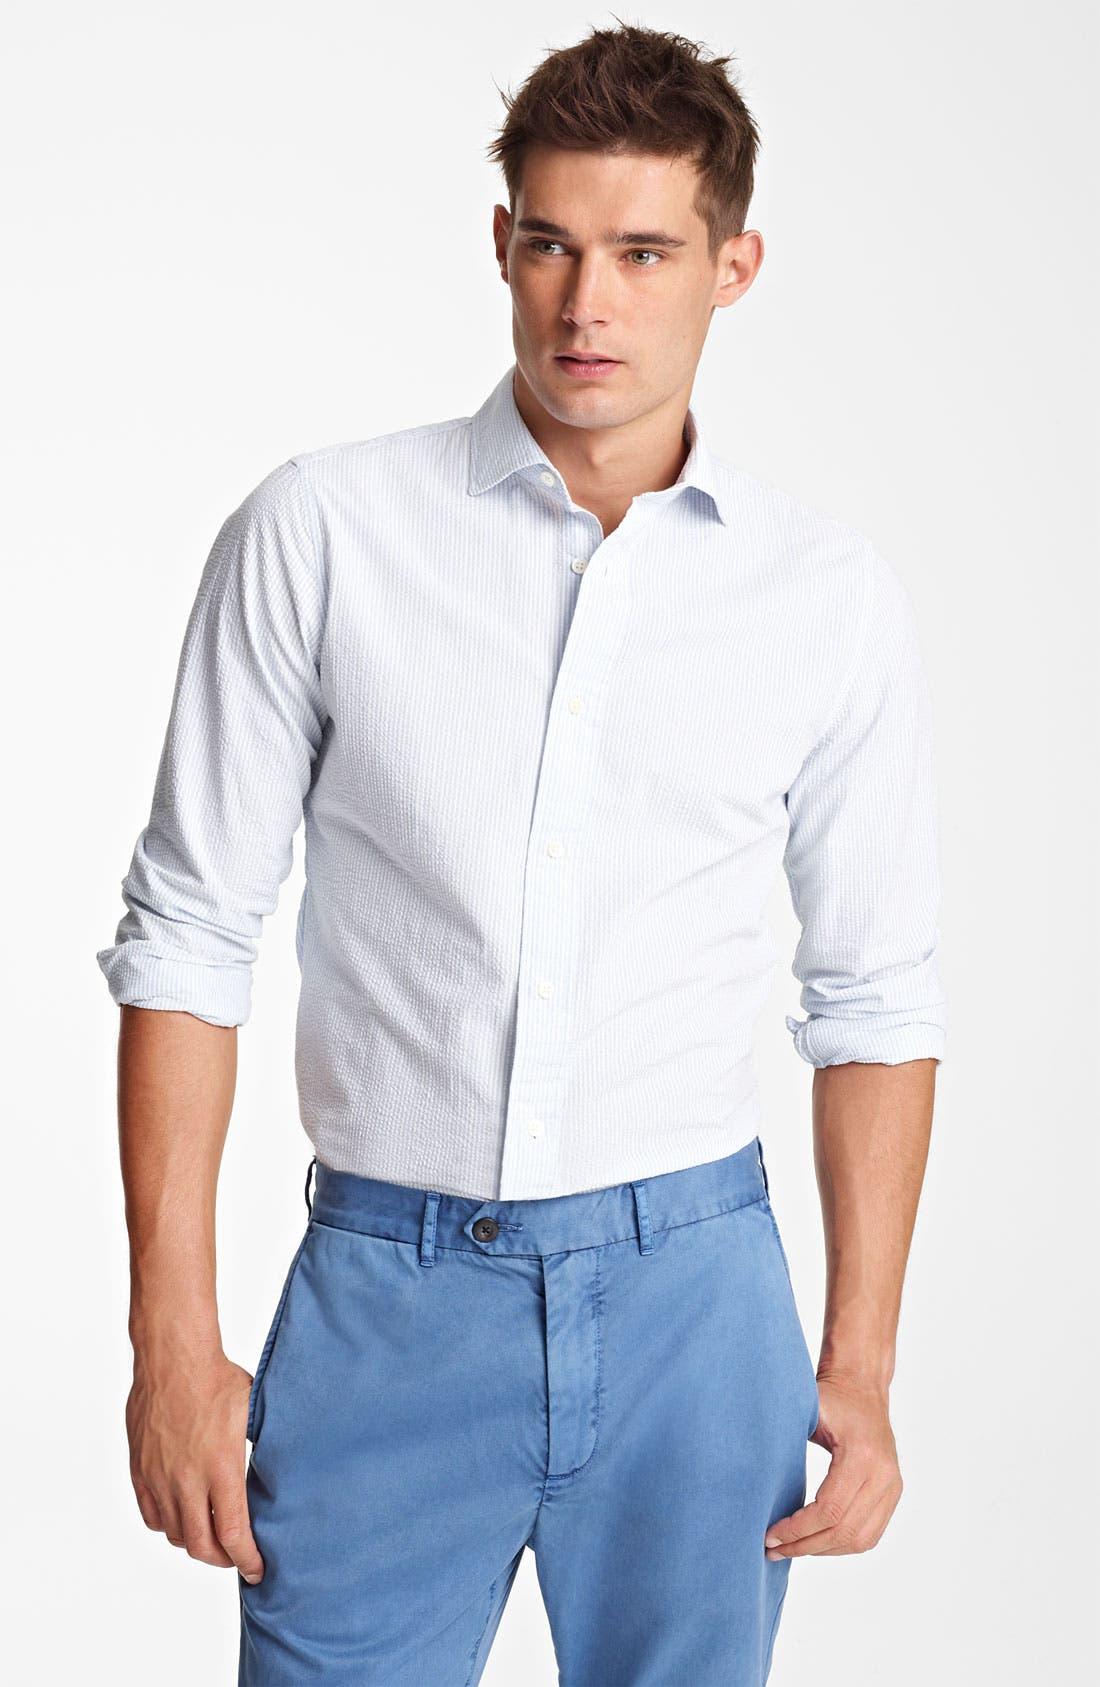 Alternate Image 1 Selected - Jack Spade 'Trombo' Seersucker Stripe Shirt